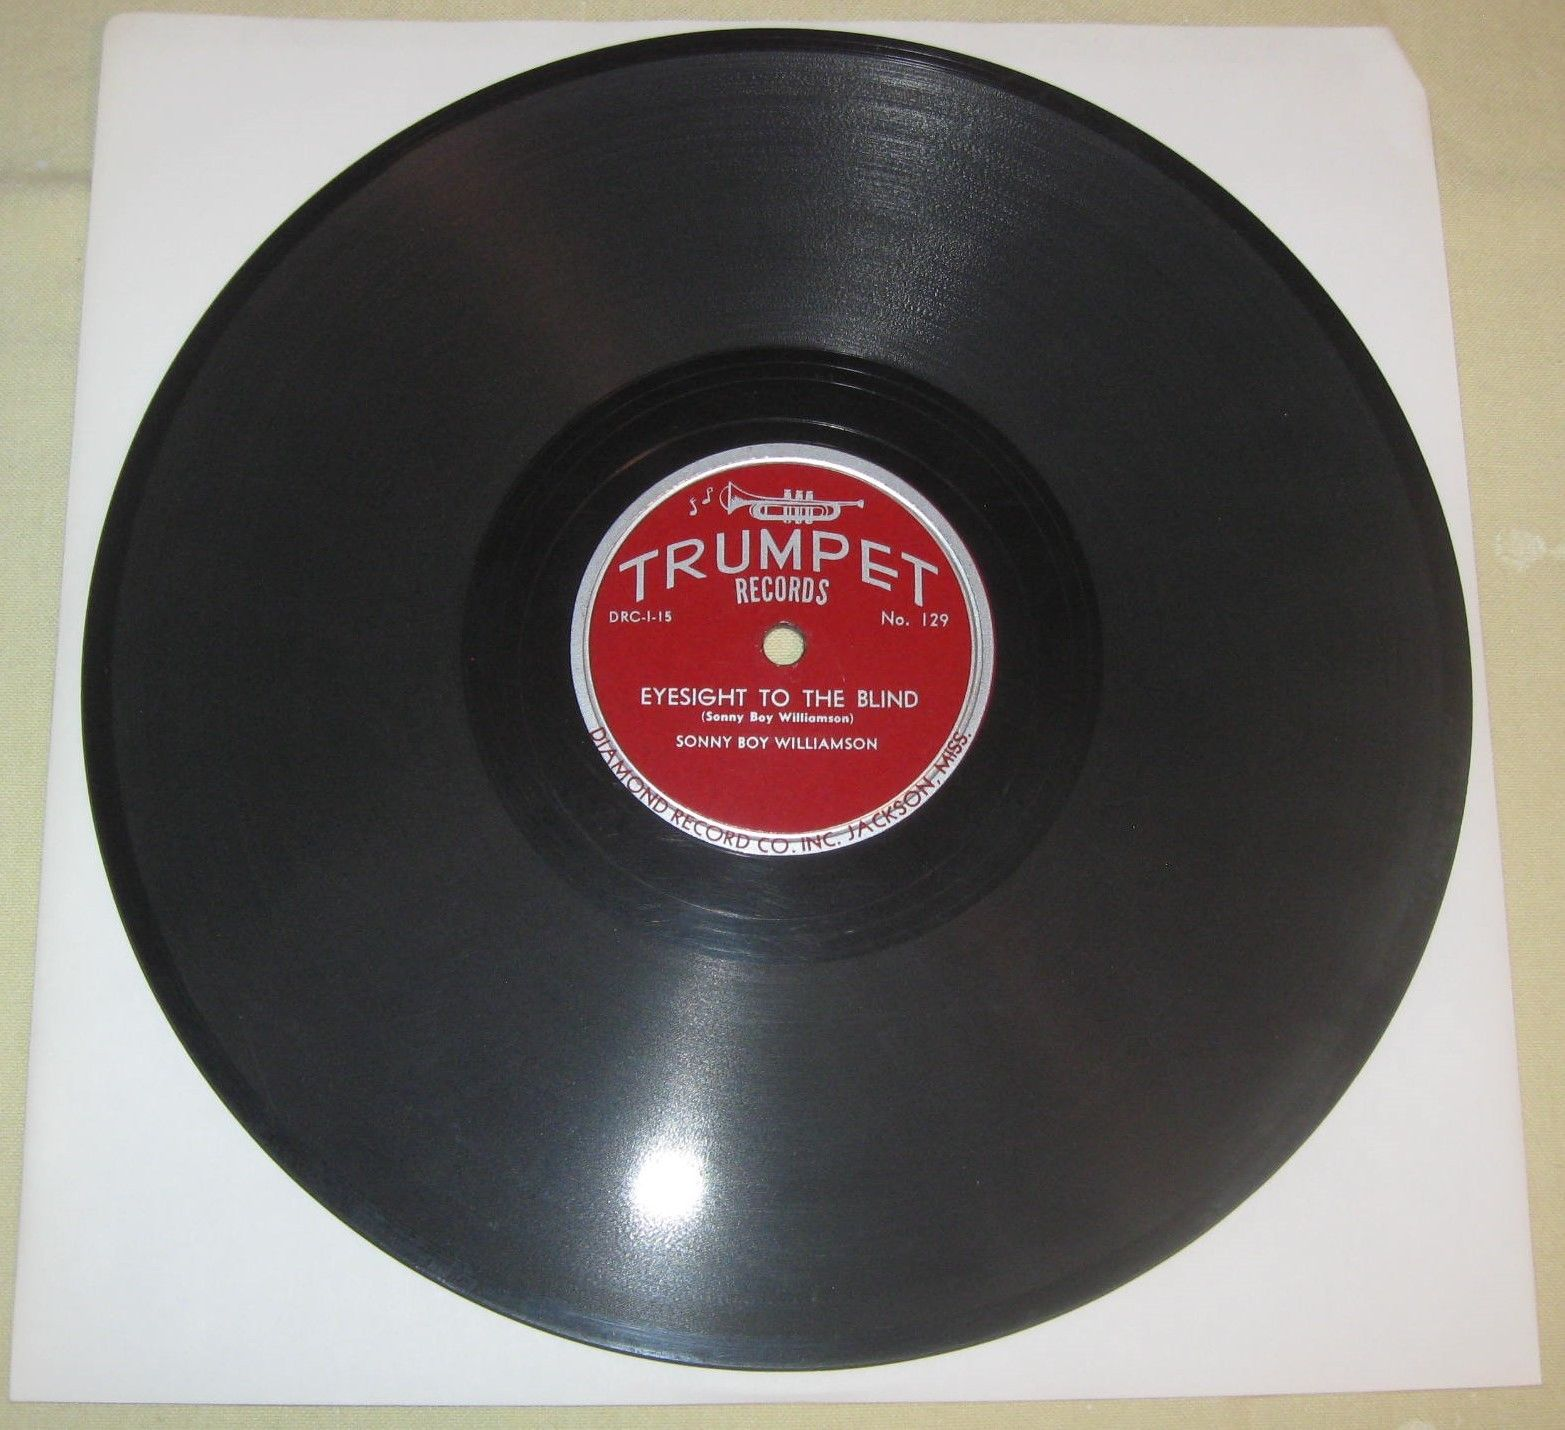 Sonny Boy Williamson #2 - Trumpet 129 - Crazy About You Baby / Eyesight